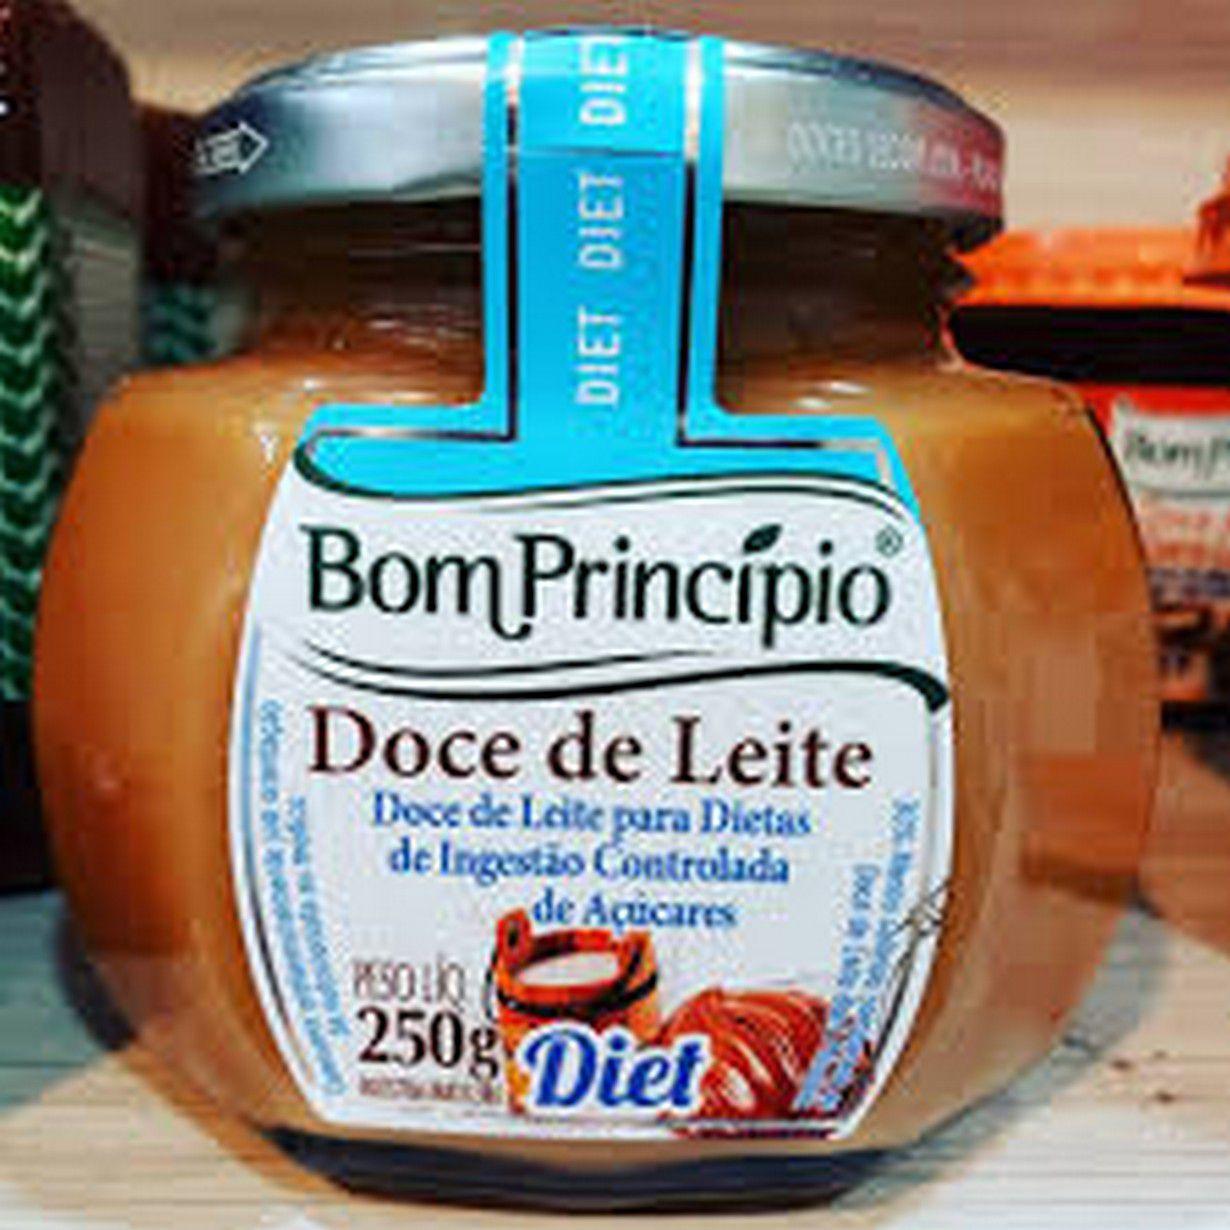 DOCE DE LEITE DIET 250G BOM PRINCÍPIO